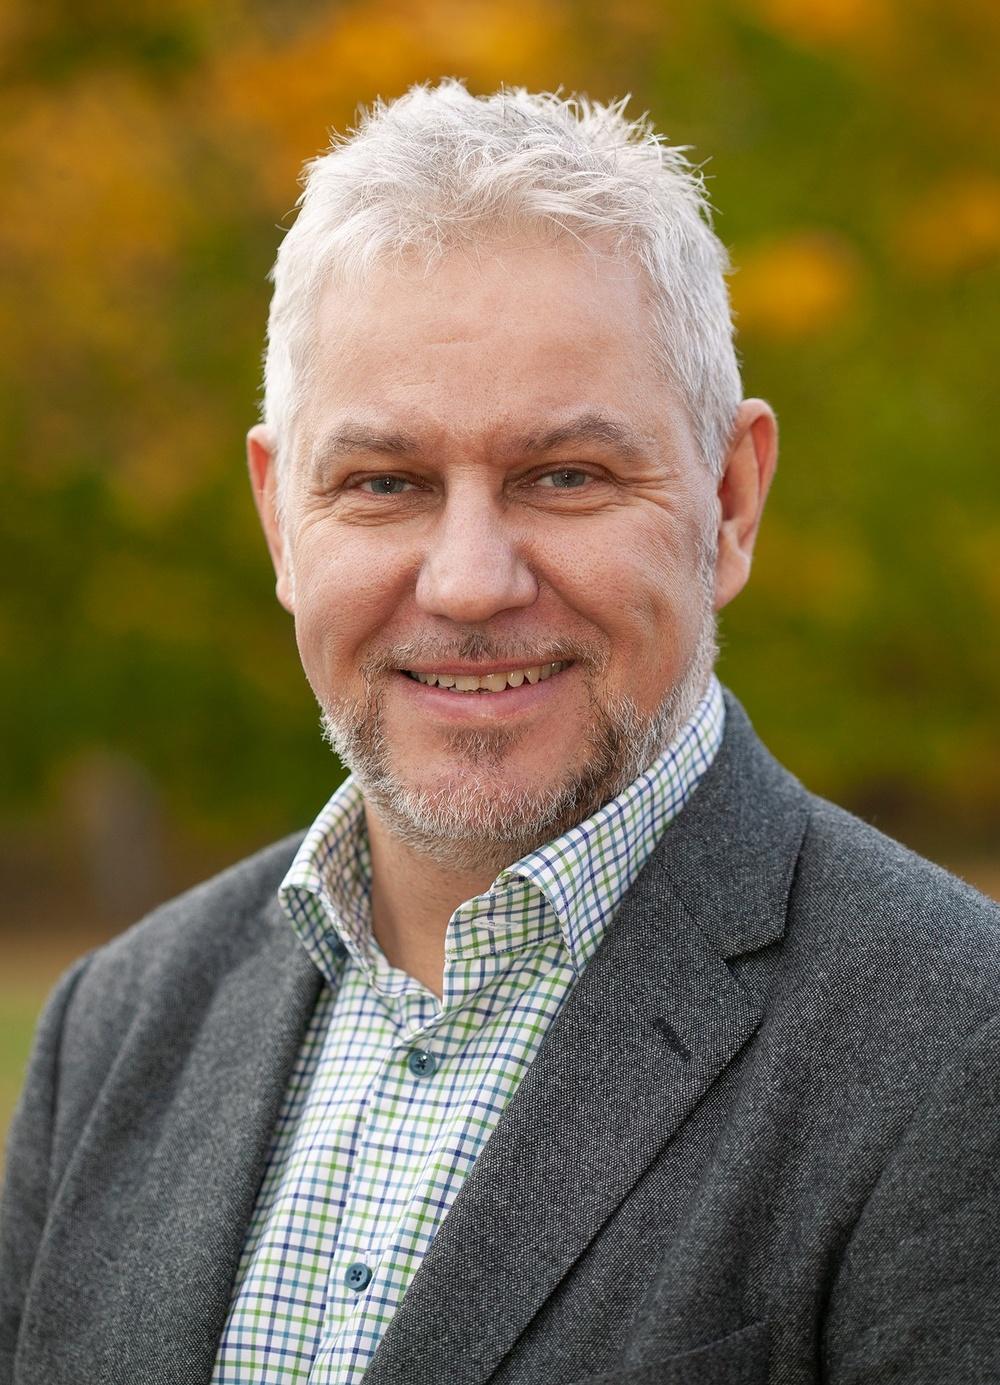 Ulrik Abelson, fastighetskonsult på Skogssällskapet. Foto: Jonny Flink